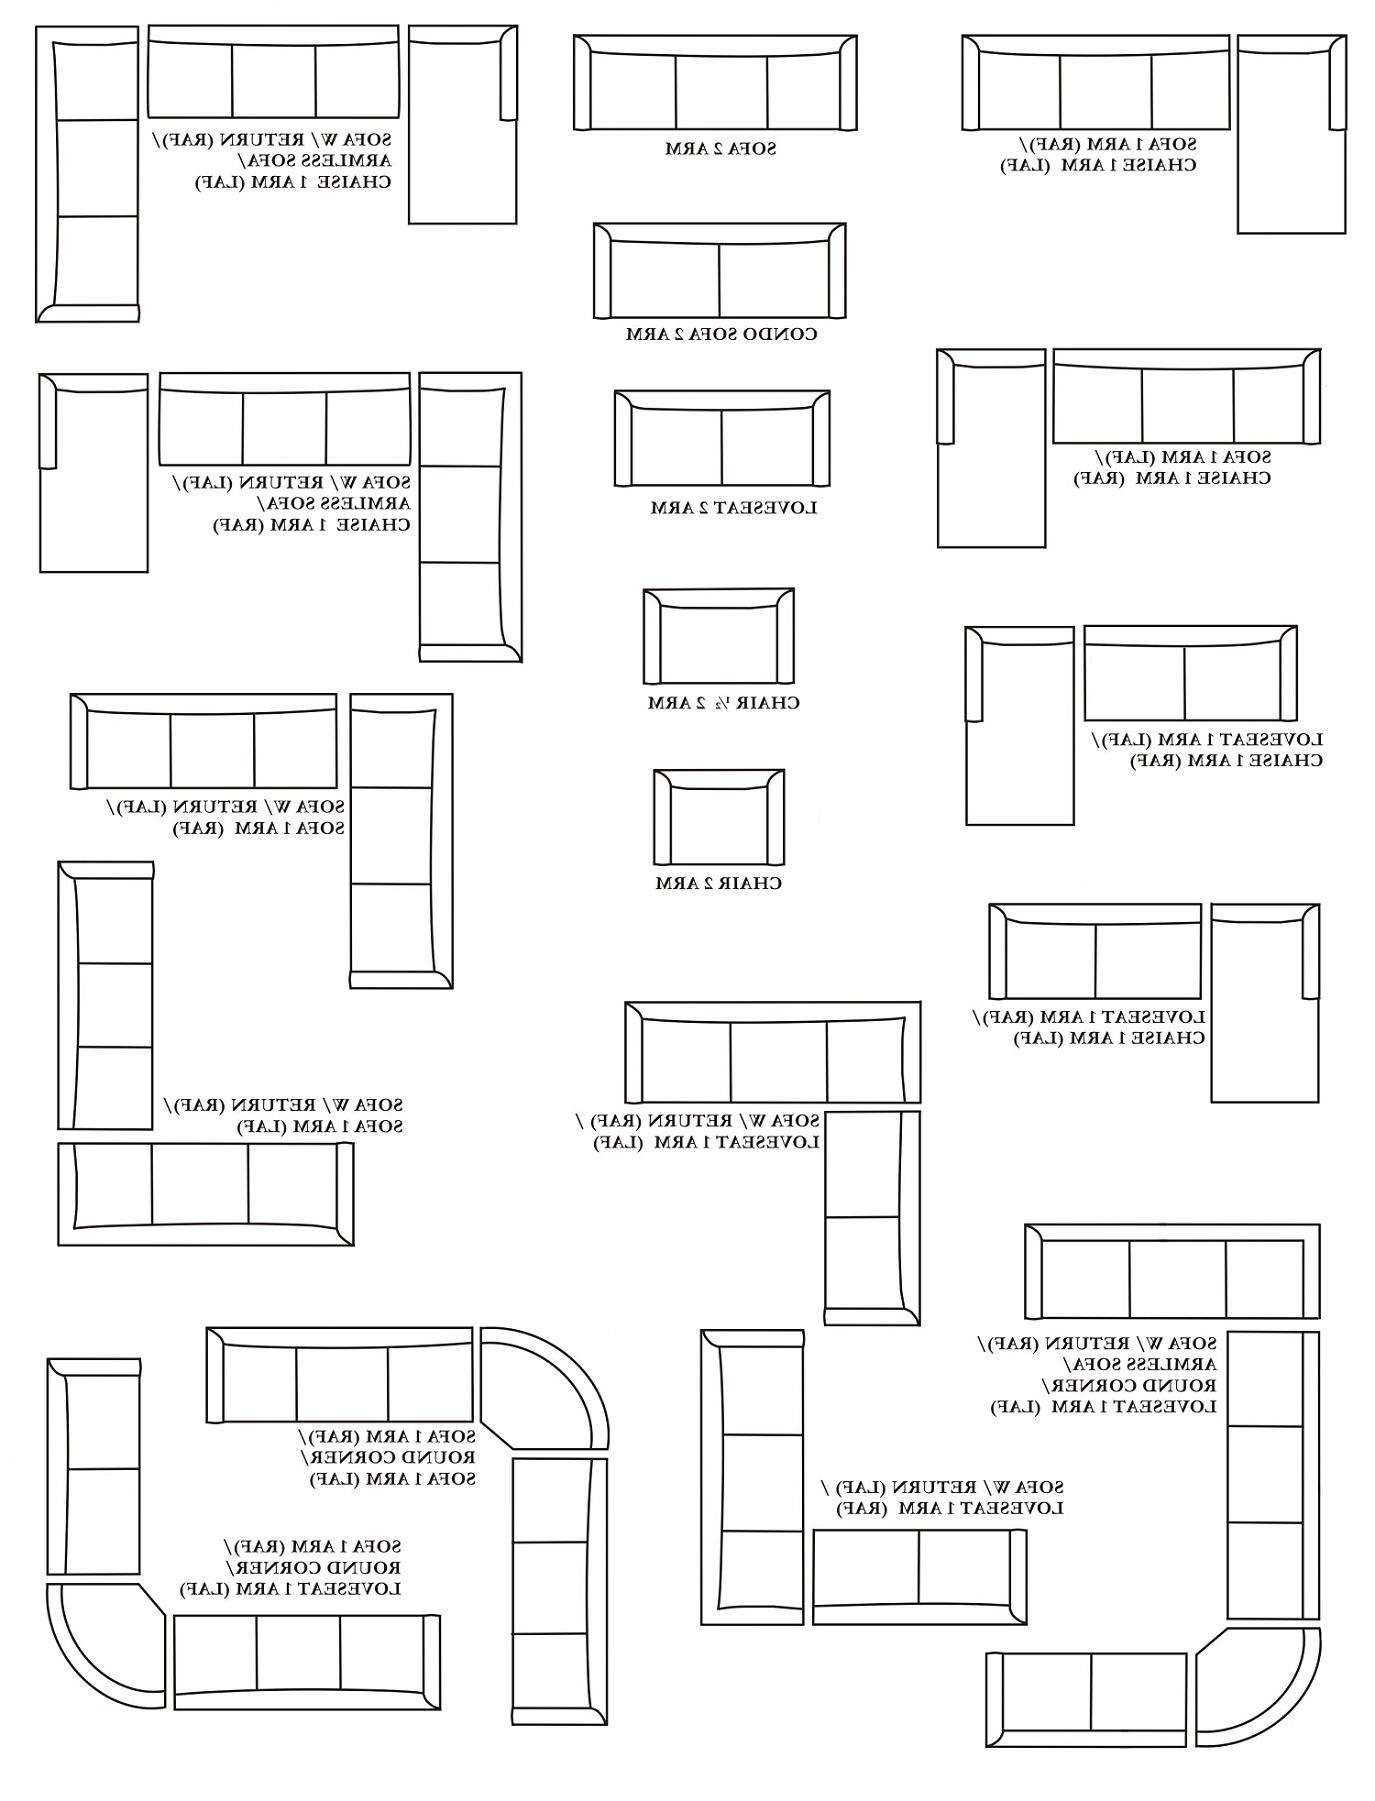 Corner Cuddler Sectional Sofa, Customizable Large Sectional Within Widely Used Customizable Sectional Sofas (View 2 of 15)